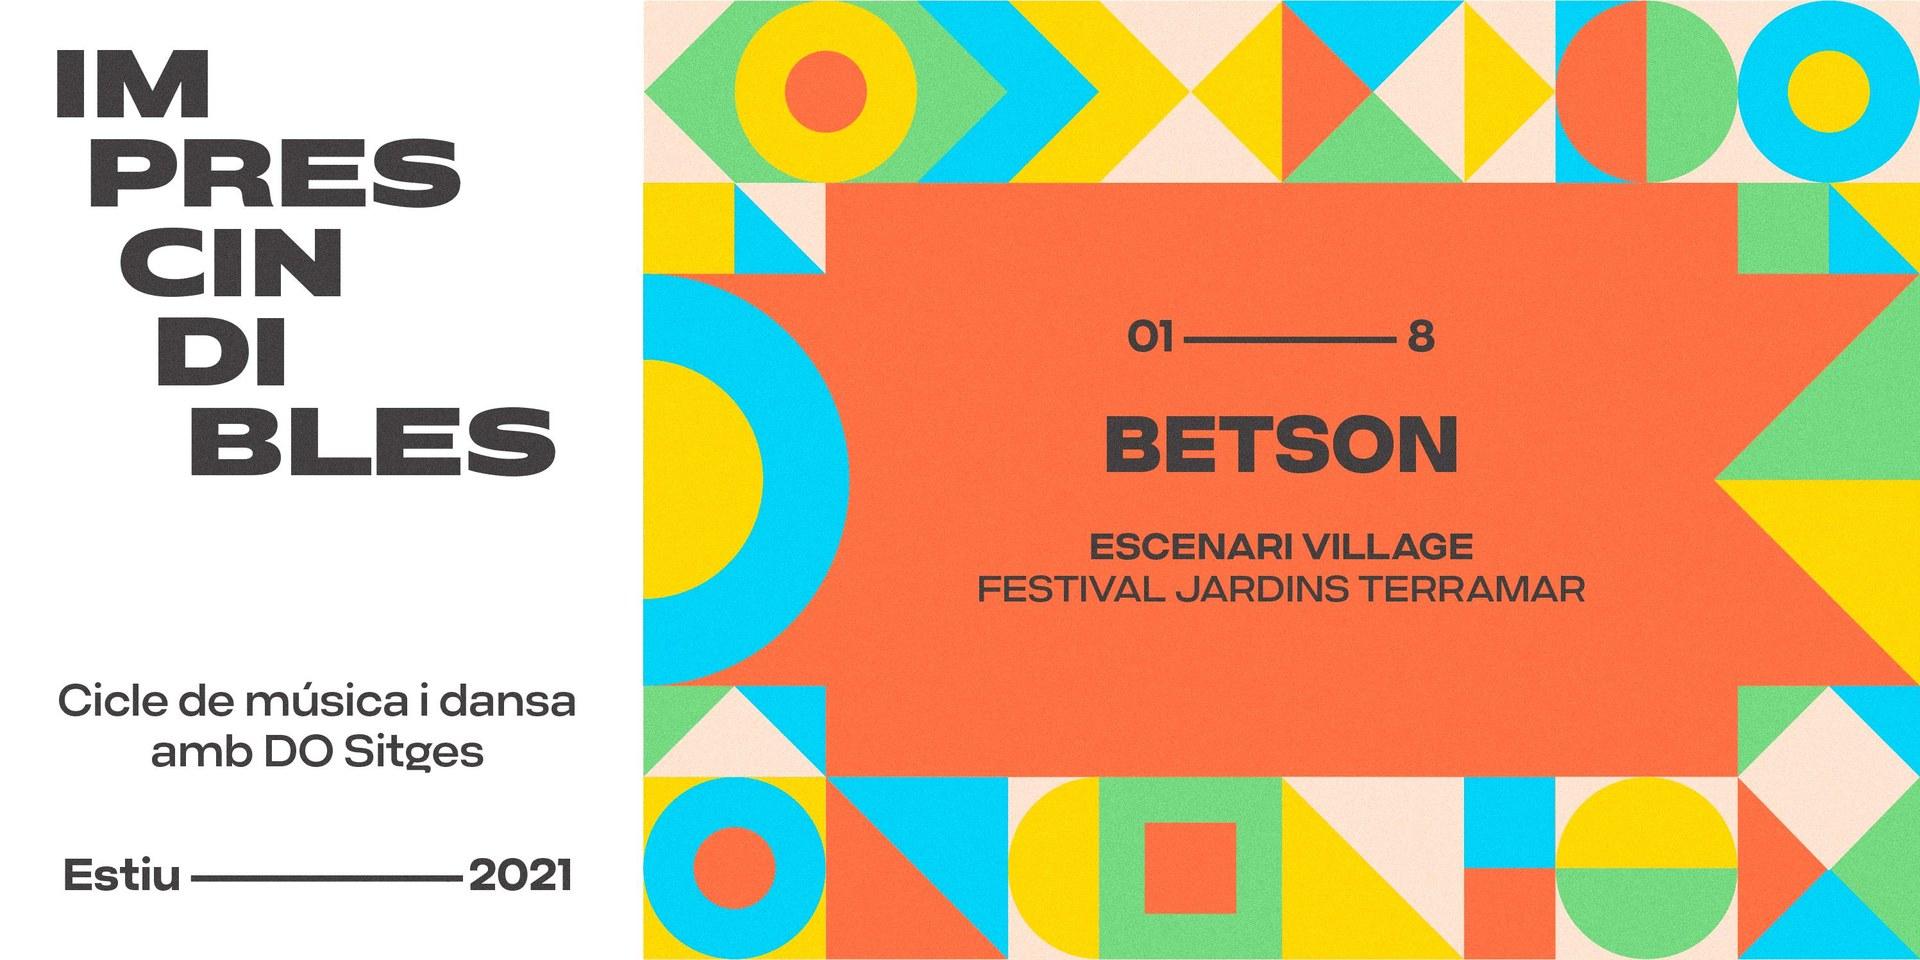 Concert de Betson